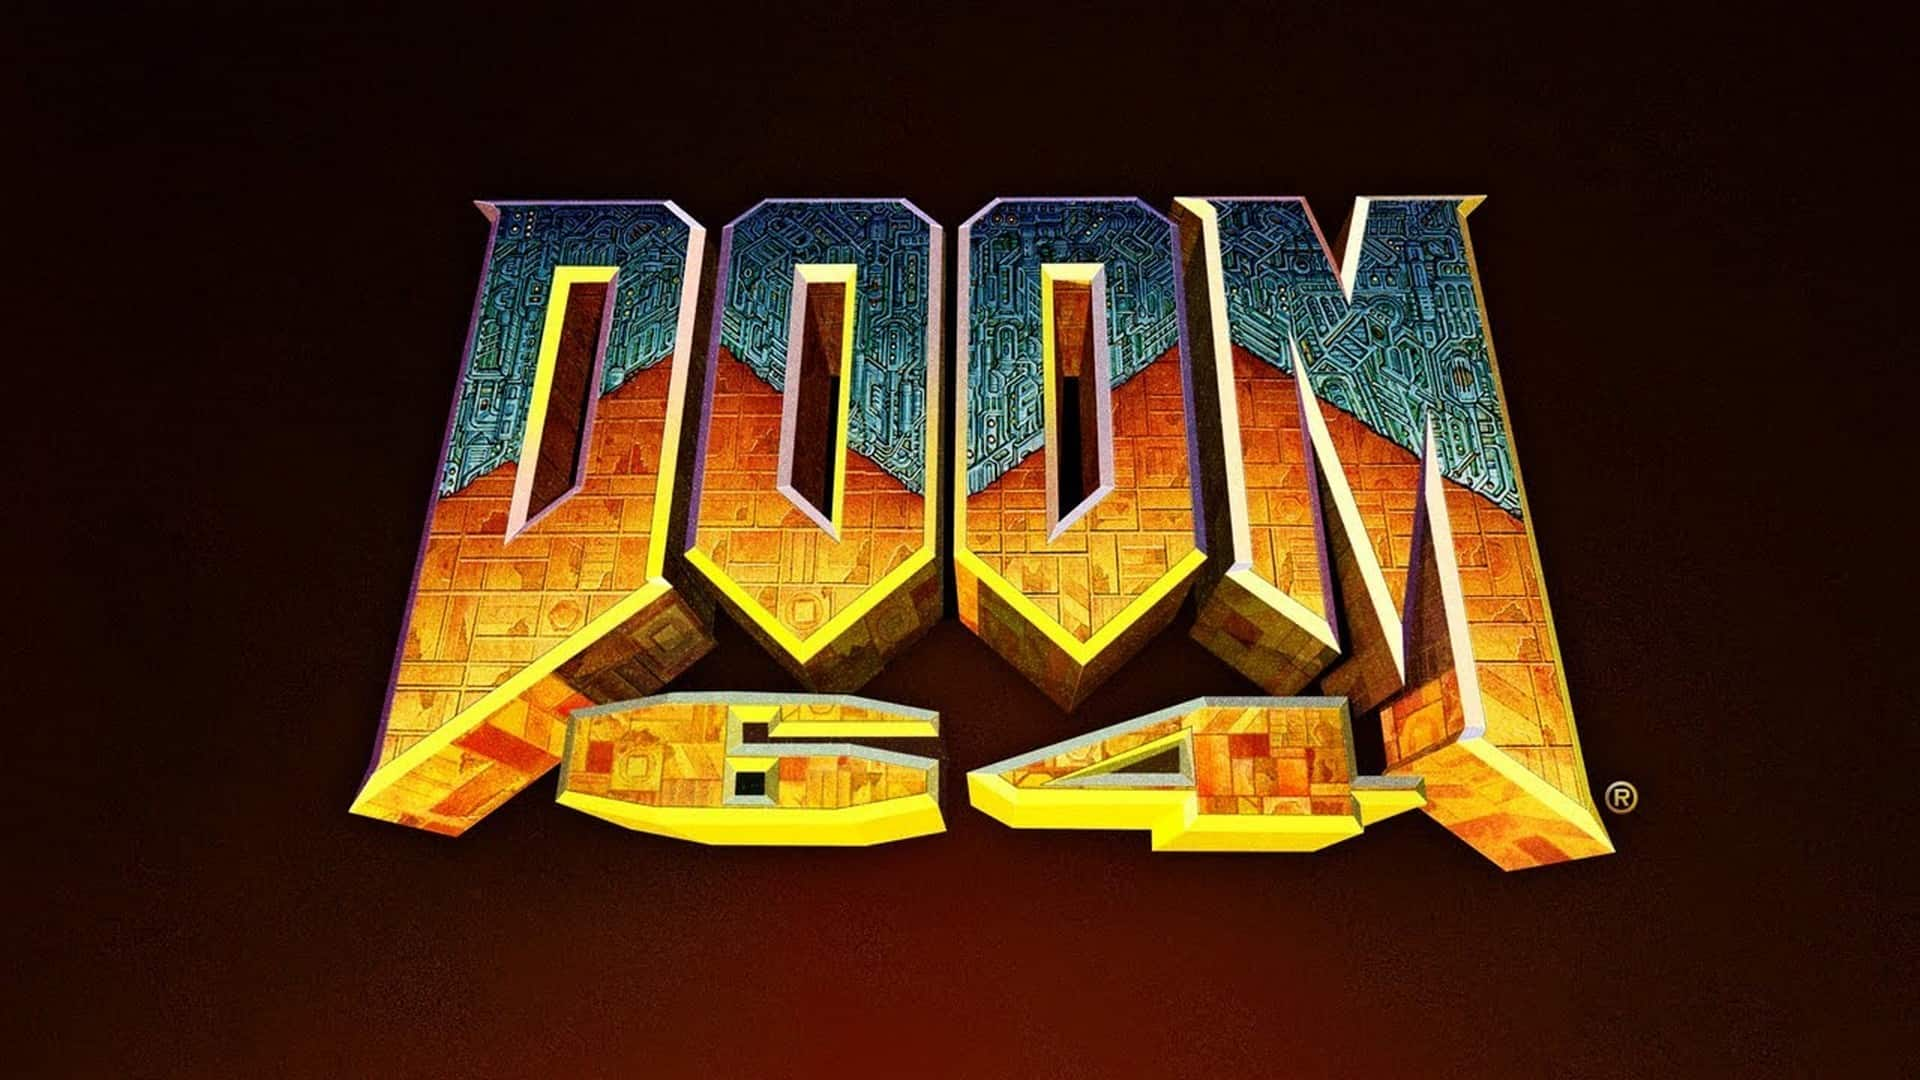 DOOM 64 Joins Roster of DOOM Eternal Pre-Order Bonuses – Releasing March 20